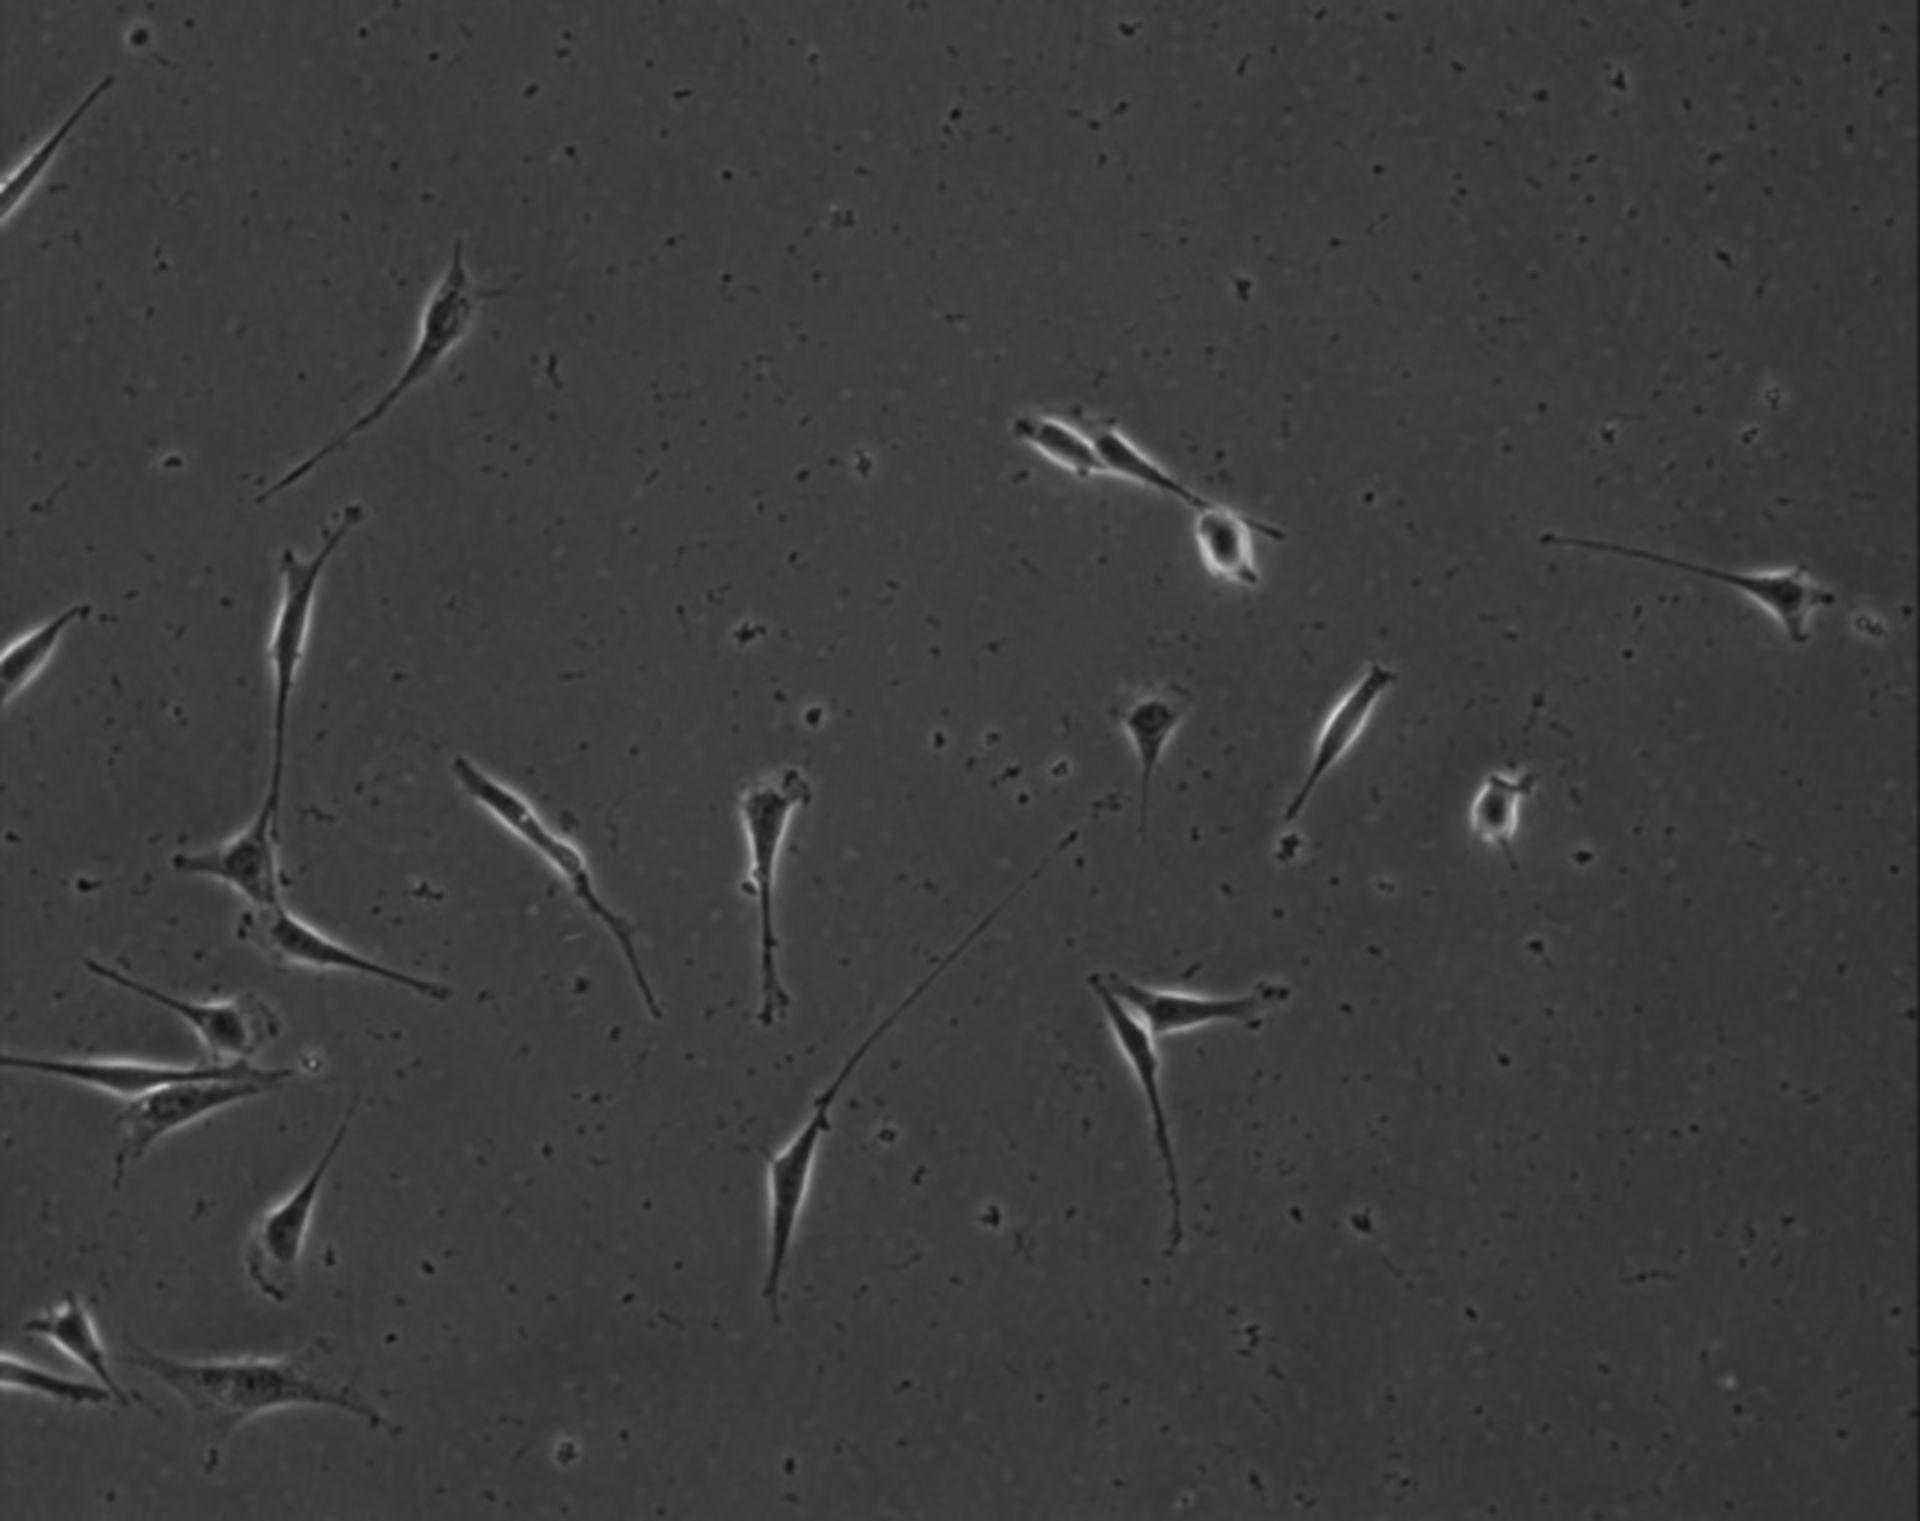 Mus musculus (Extracellular matrix part) - CIL:8918